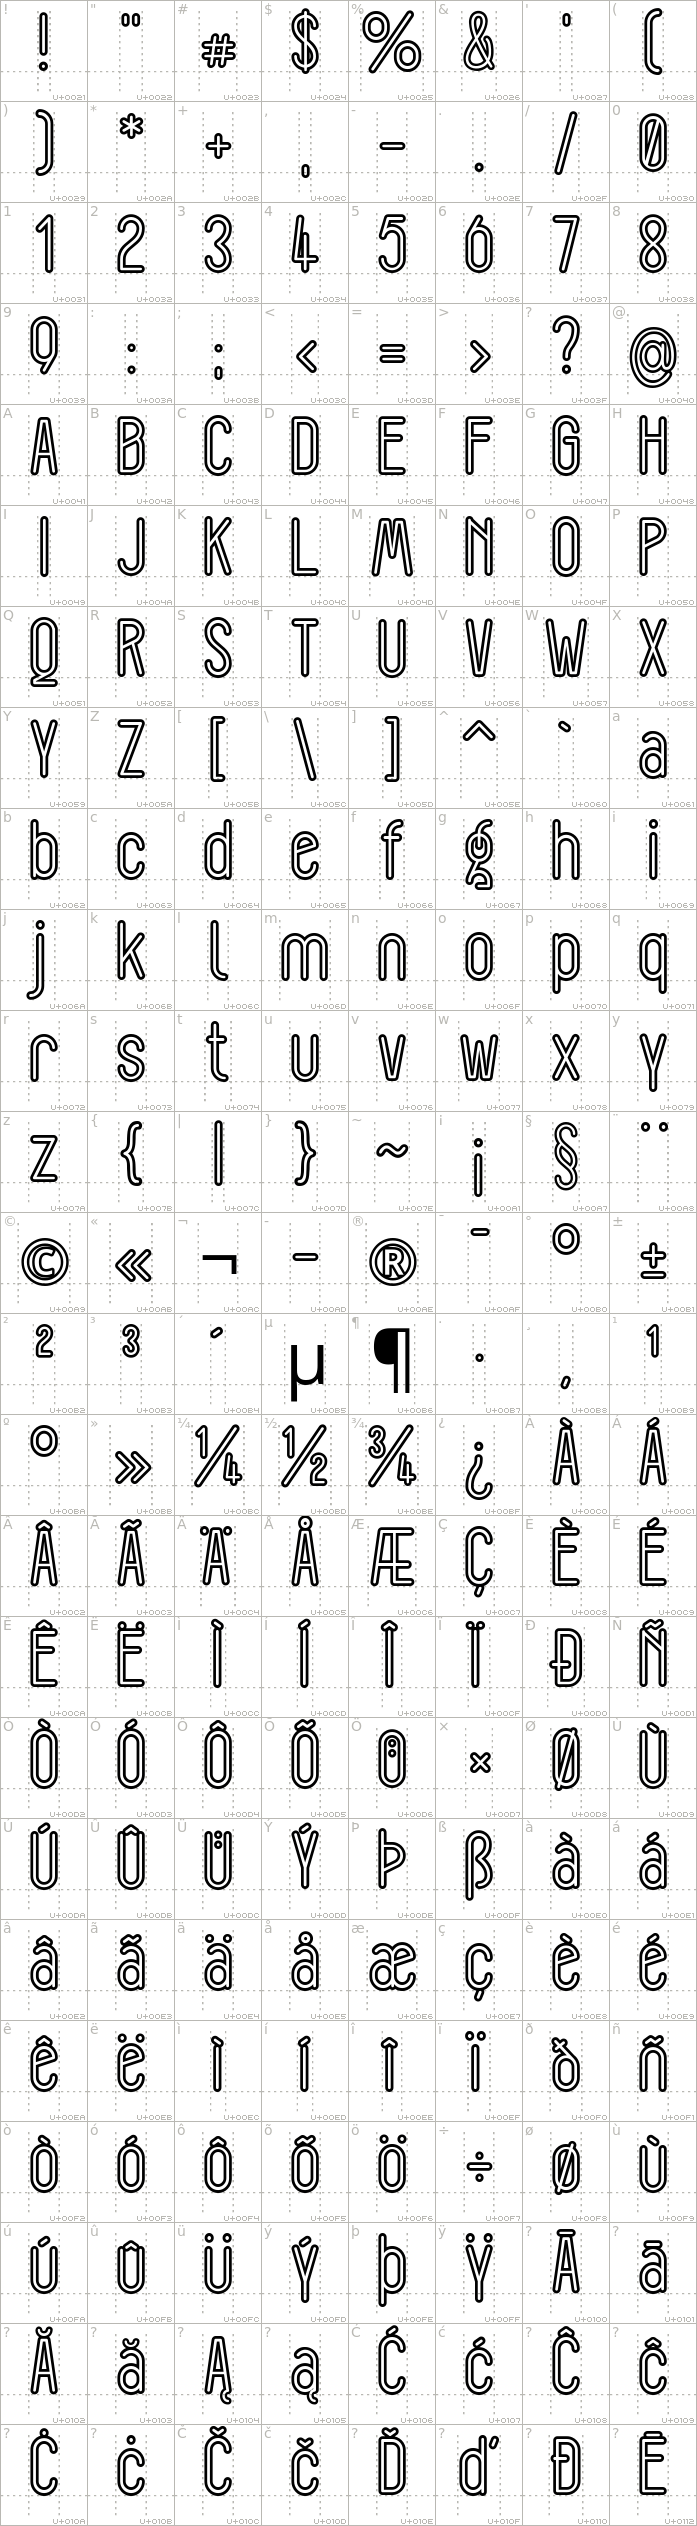 lorem-ipsum.regular.character-map-1